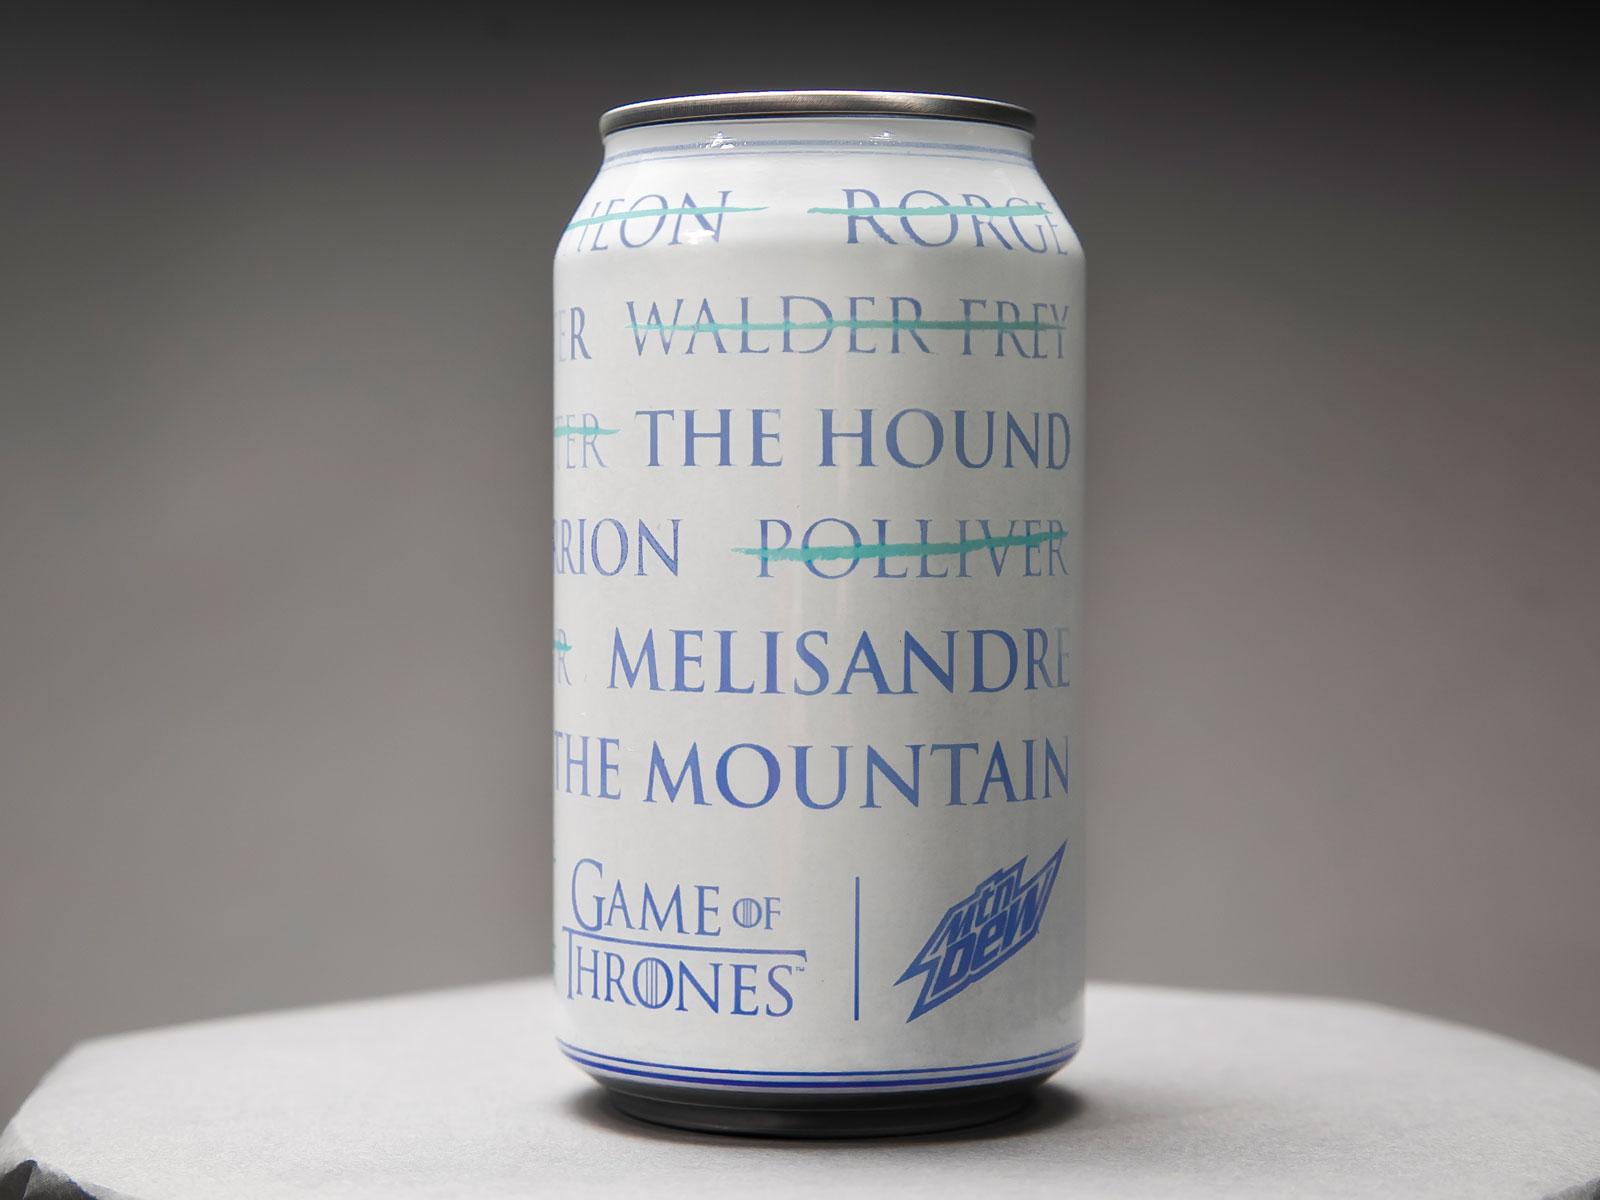 Mtn Dew Game of Thrones